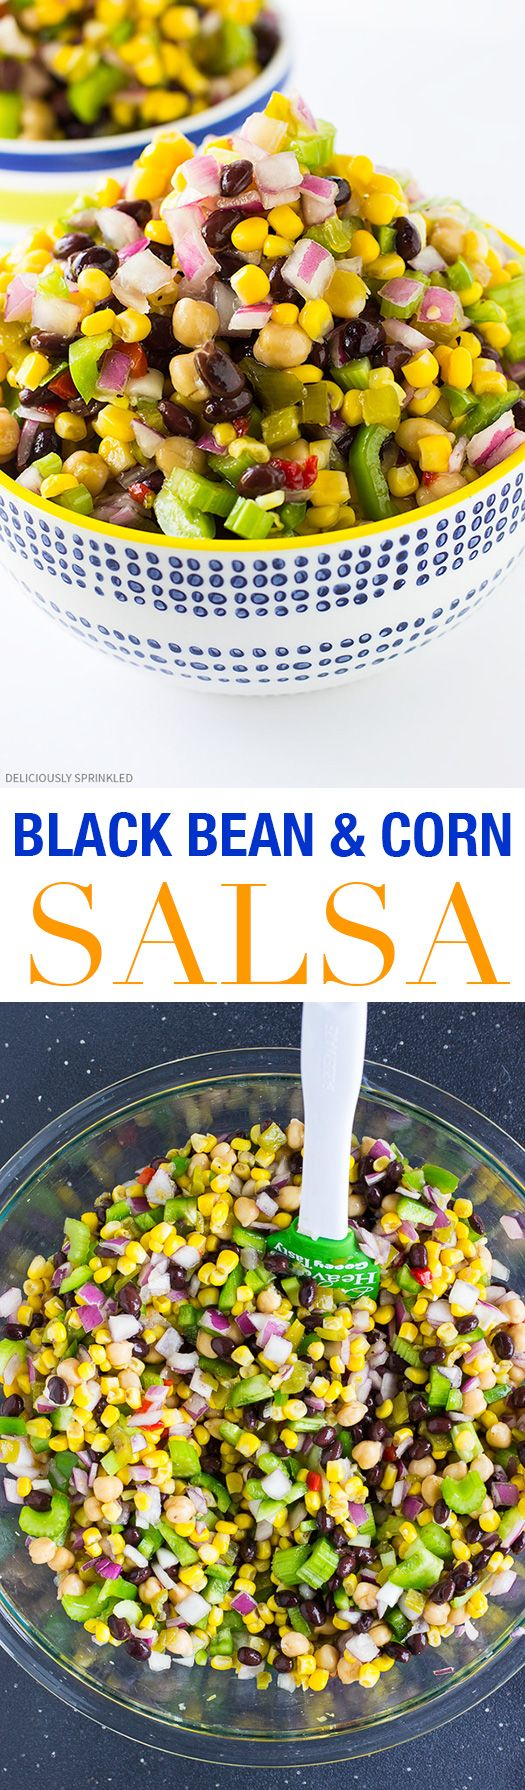 The BEST Black Bean and Corn Salsa